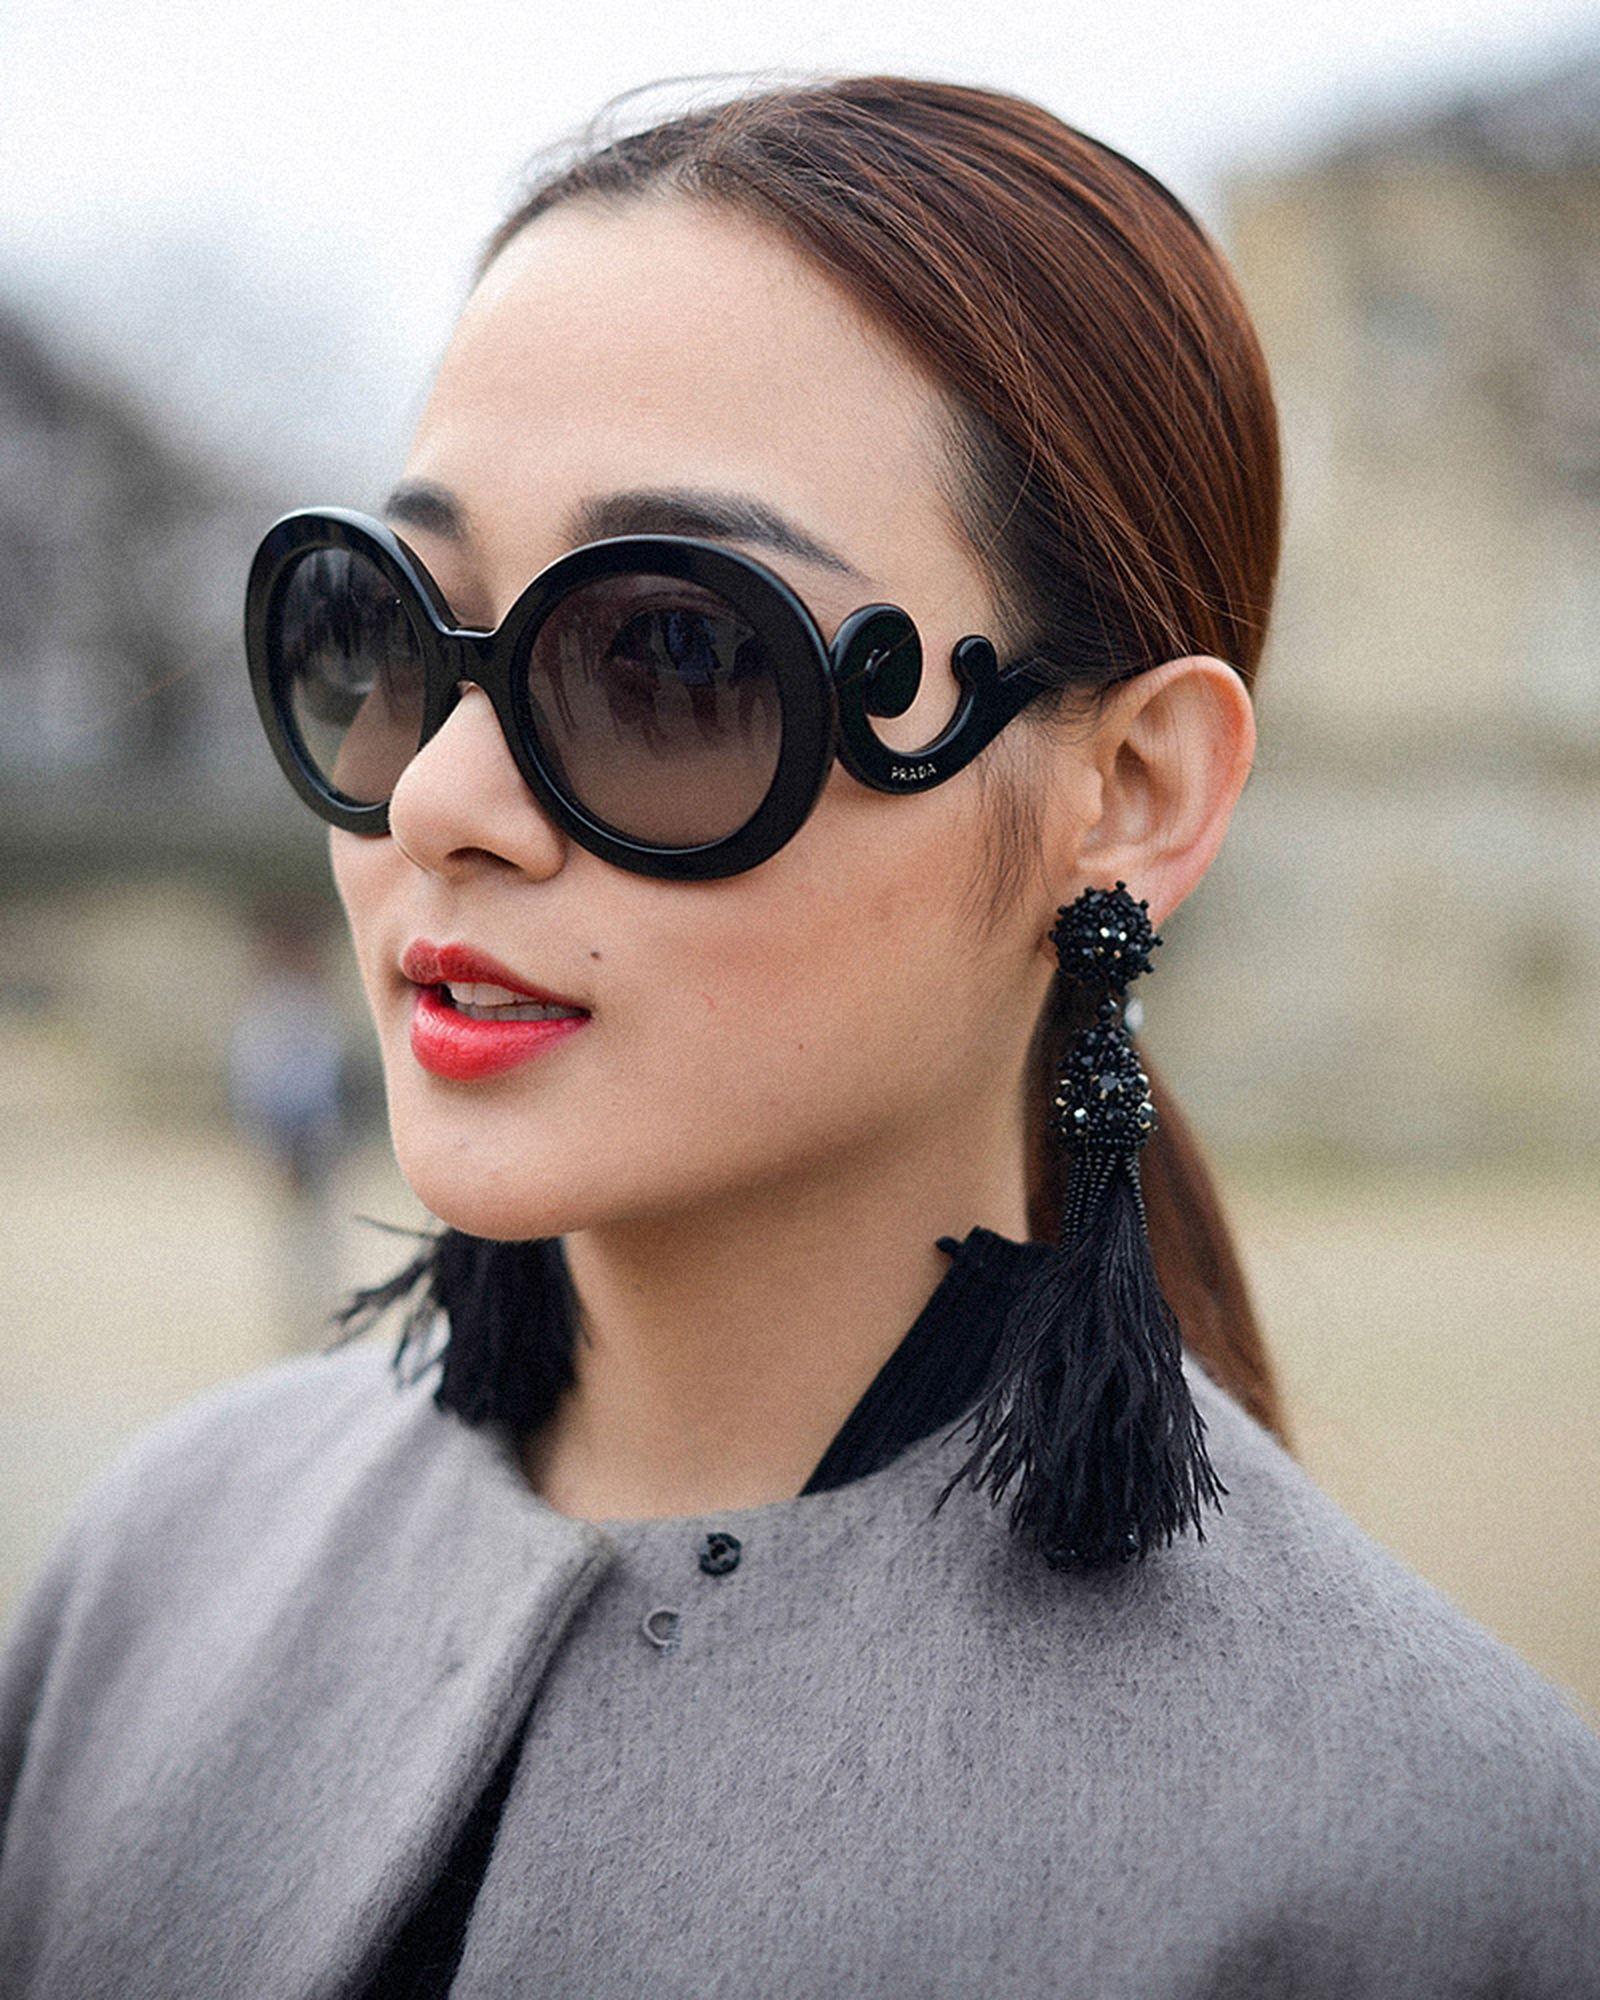 11-солнцезащитные очки-революция-мода-прада-барокко-01